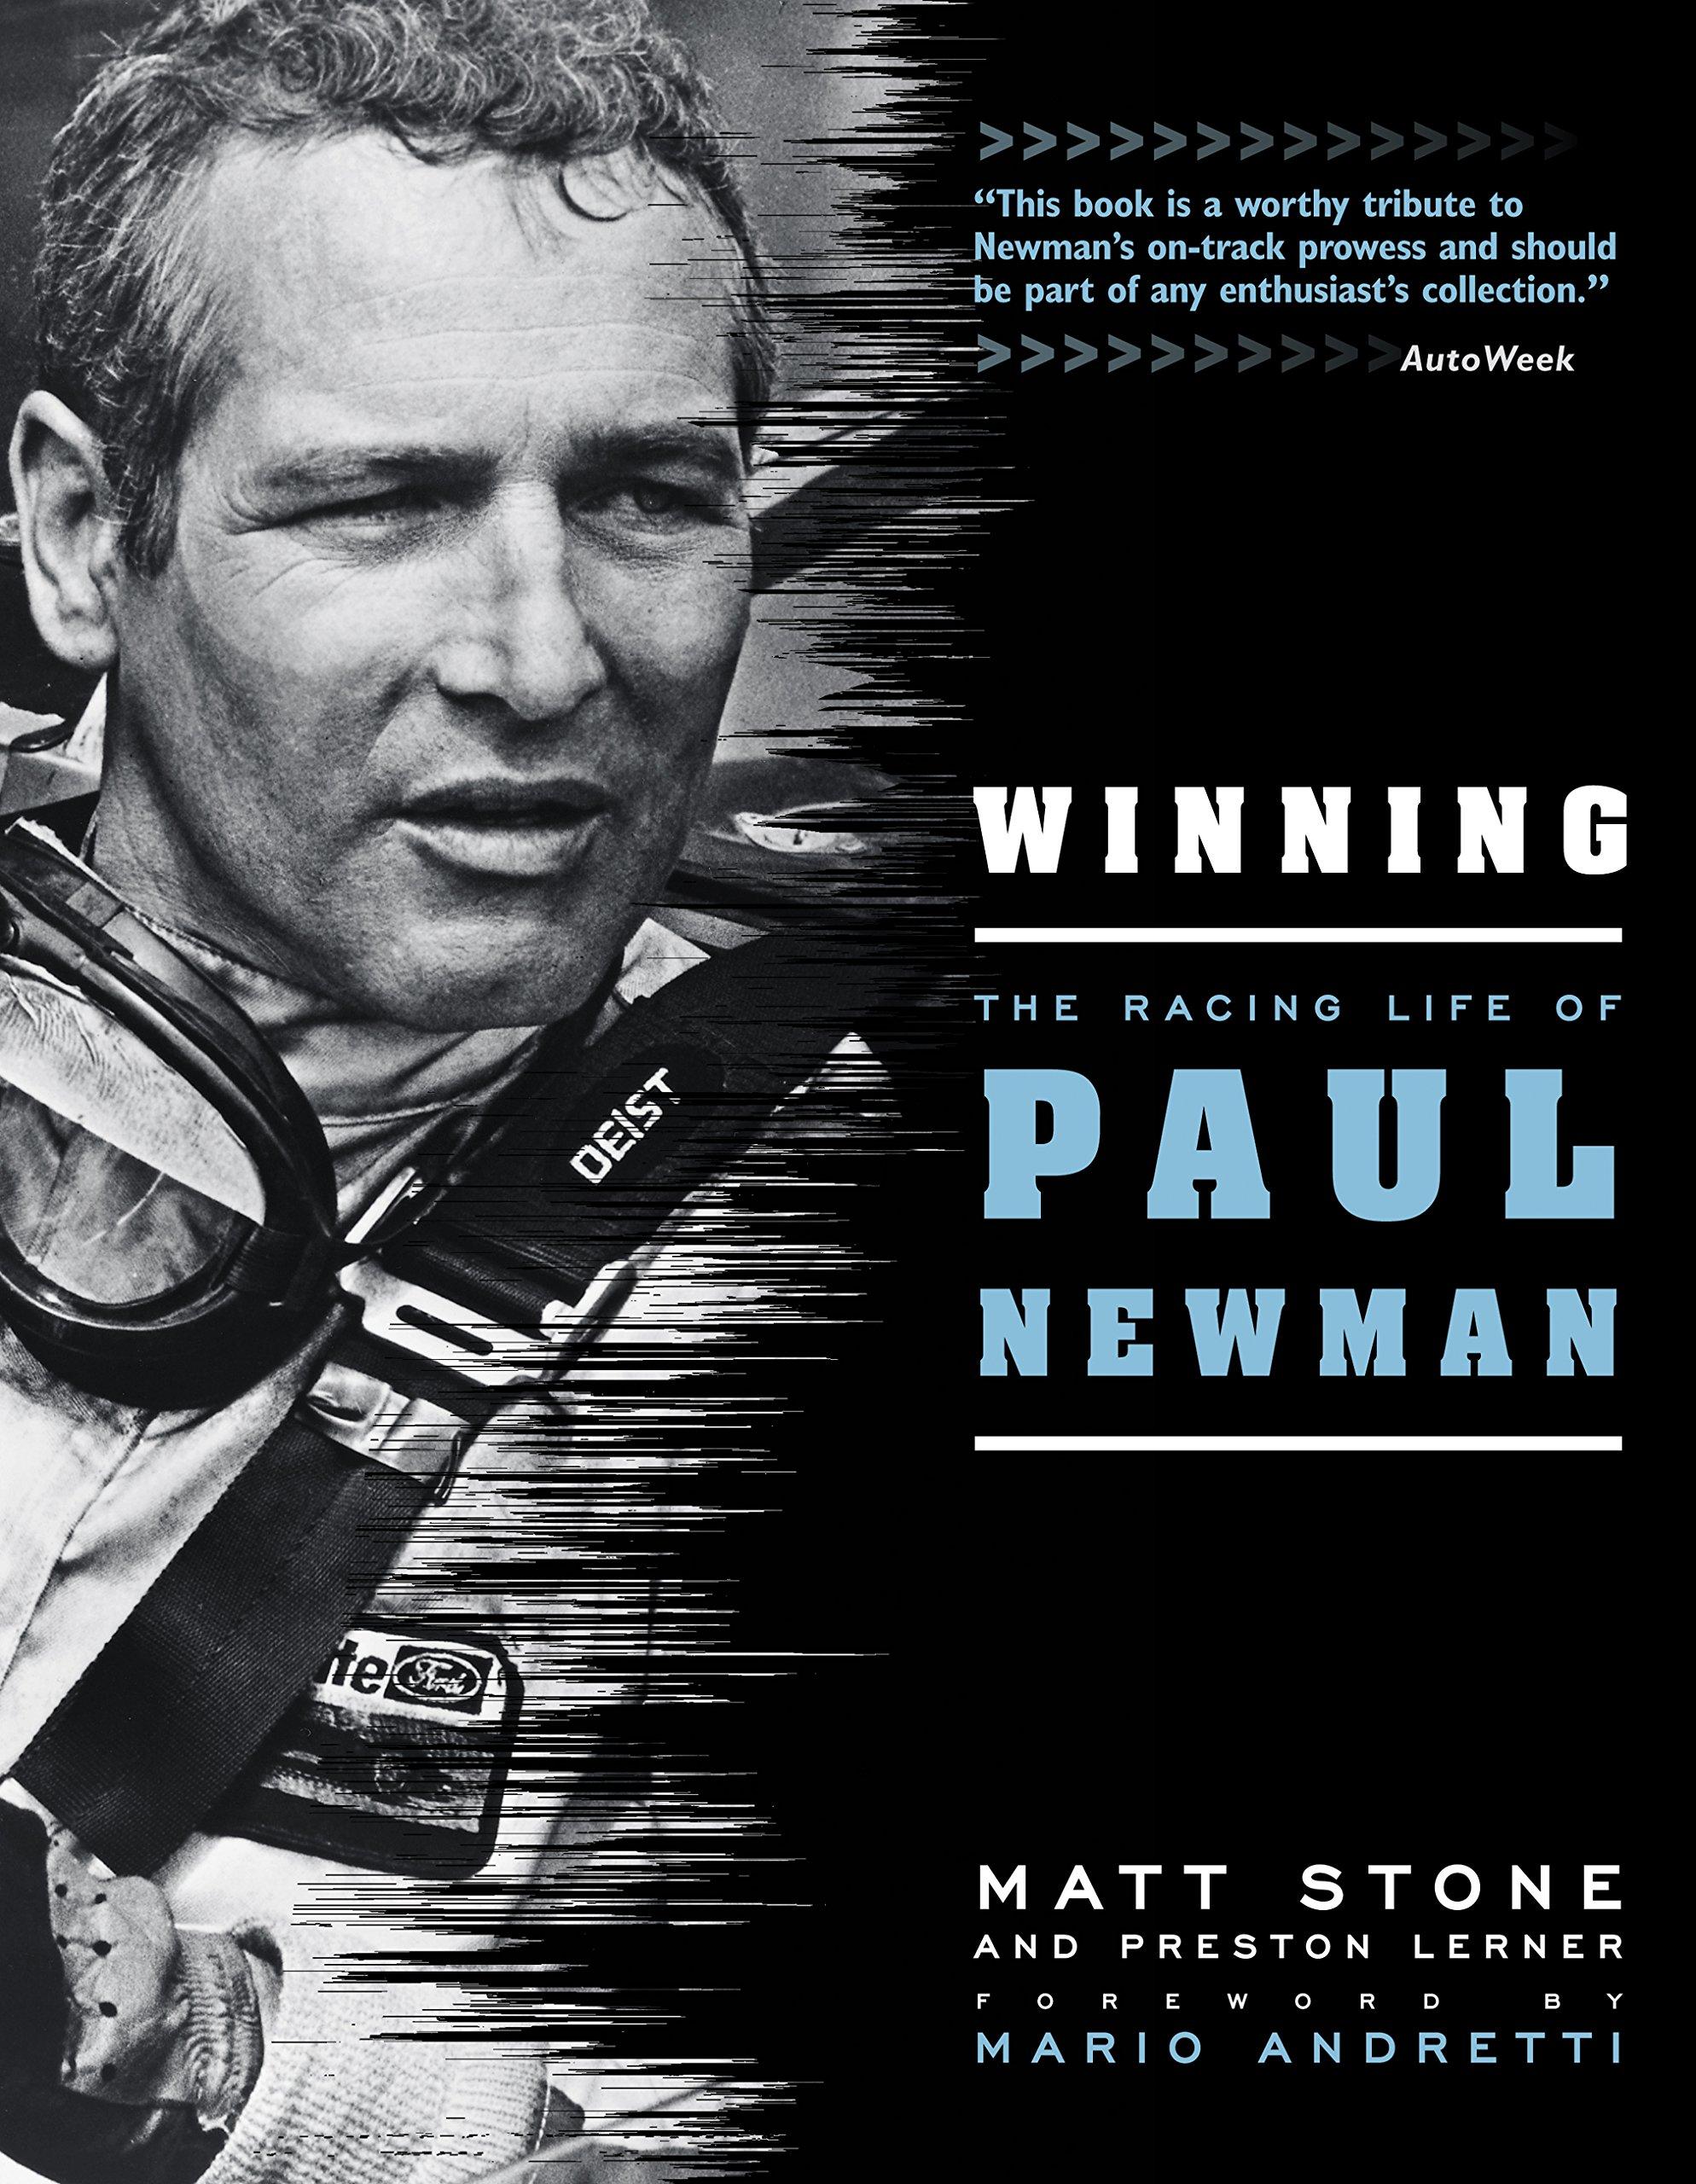 Winning: The Racing Life of Paul Newman ebook